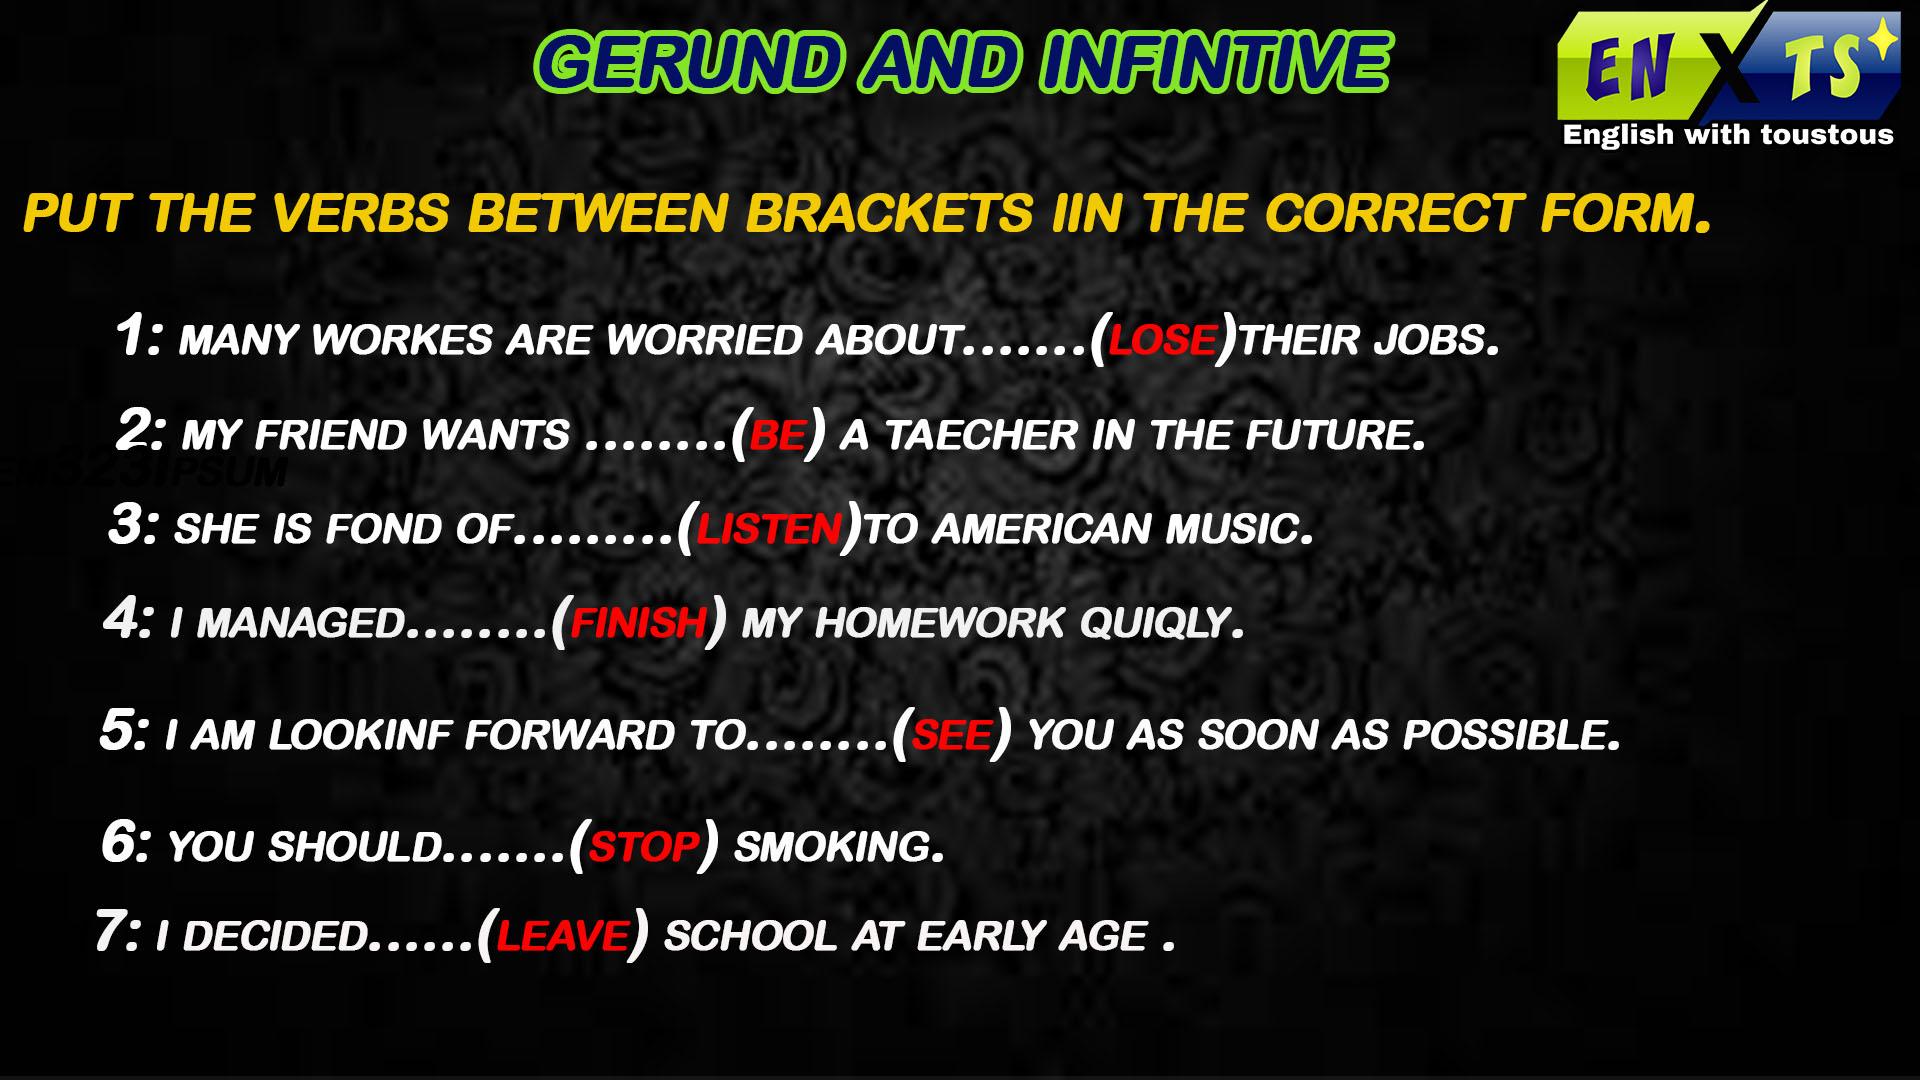 شرح بسيط  لدرس Gerund and Infinitive مع تمارين تفاعلية.